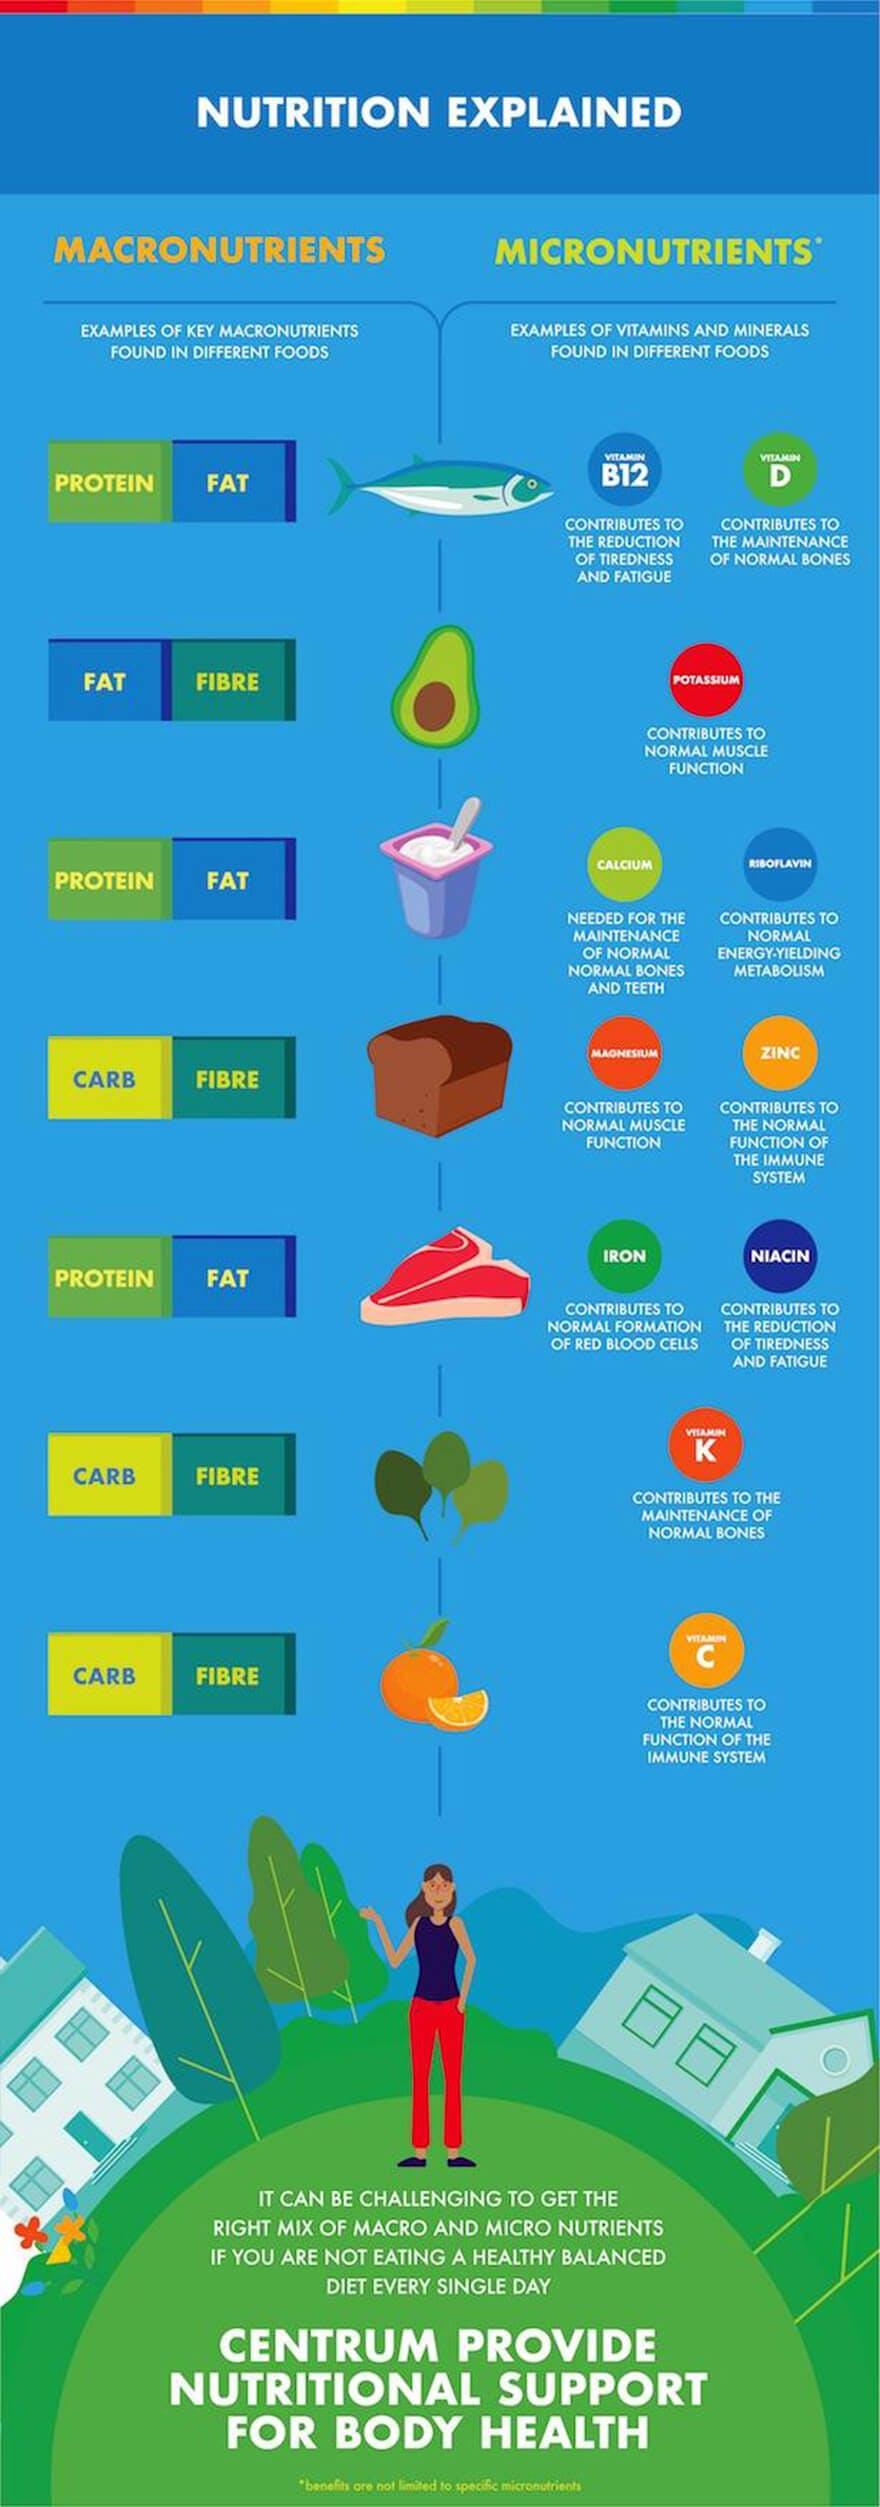 centrum_nutrition_infographic_2_1